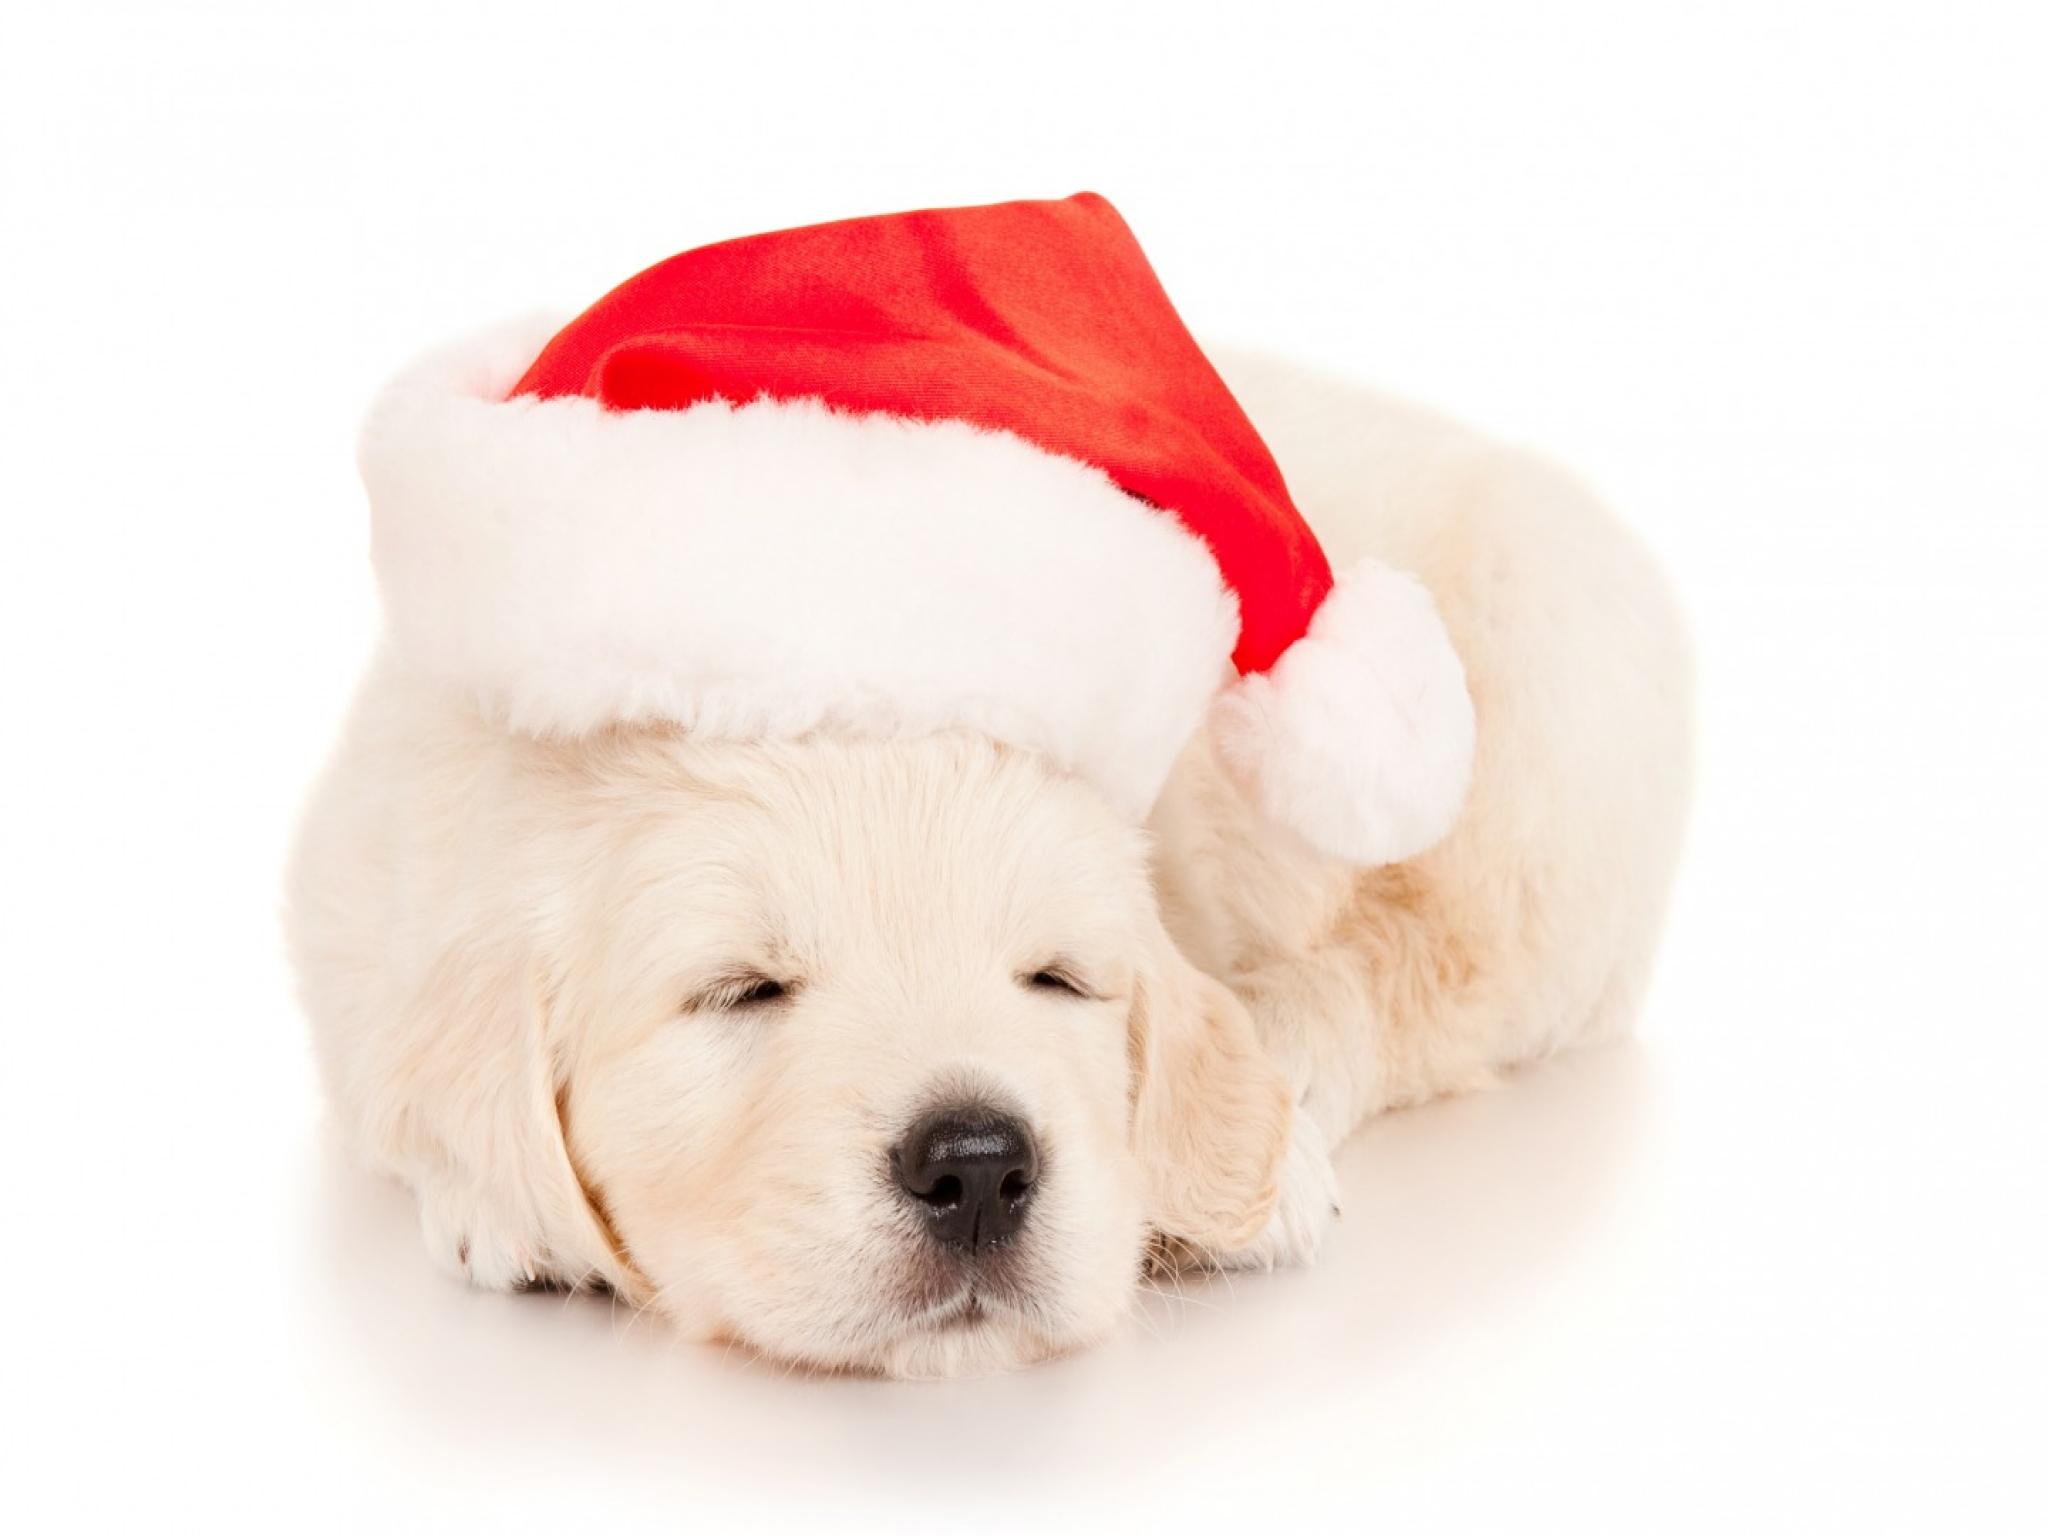 Sleeping Christmas Puppy HD Wallpaper